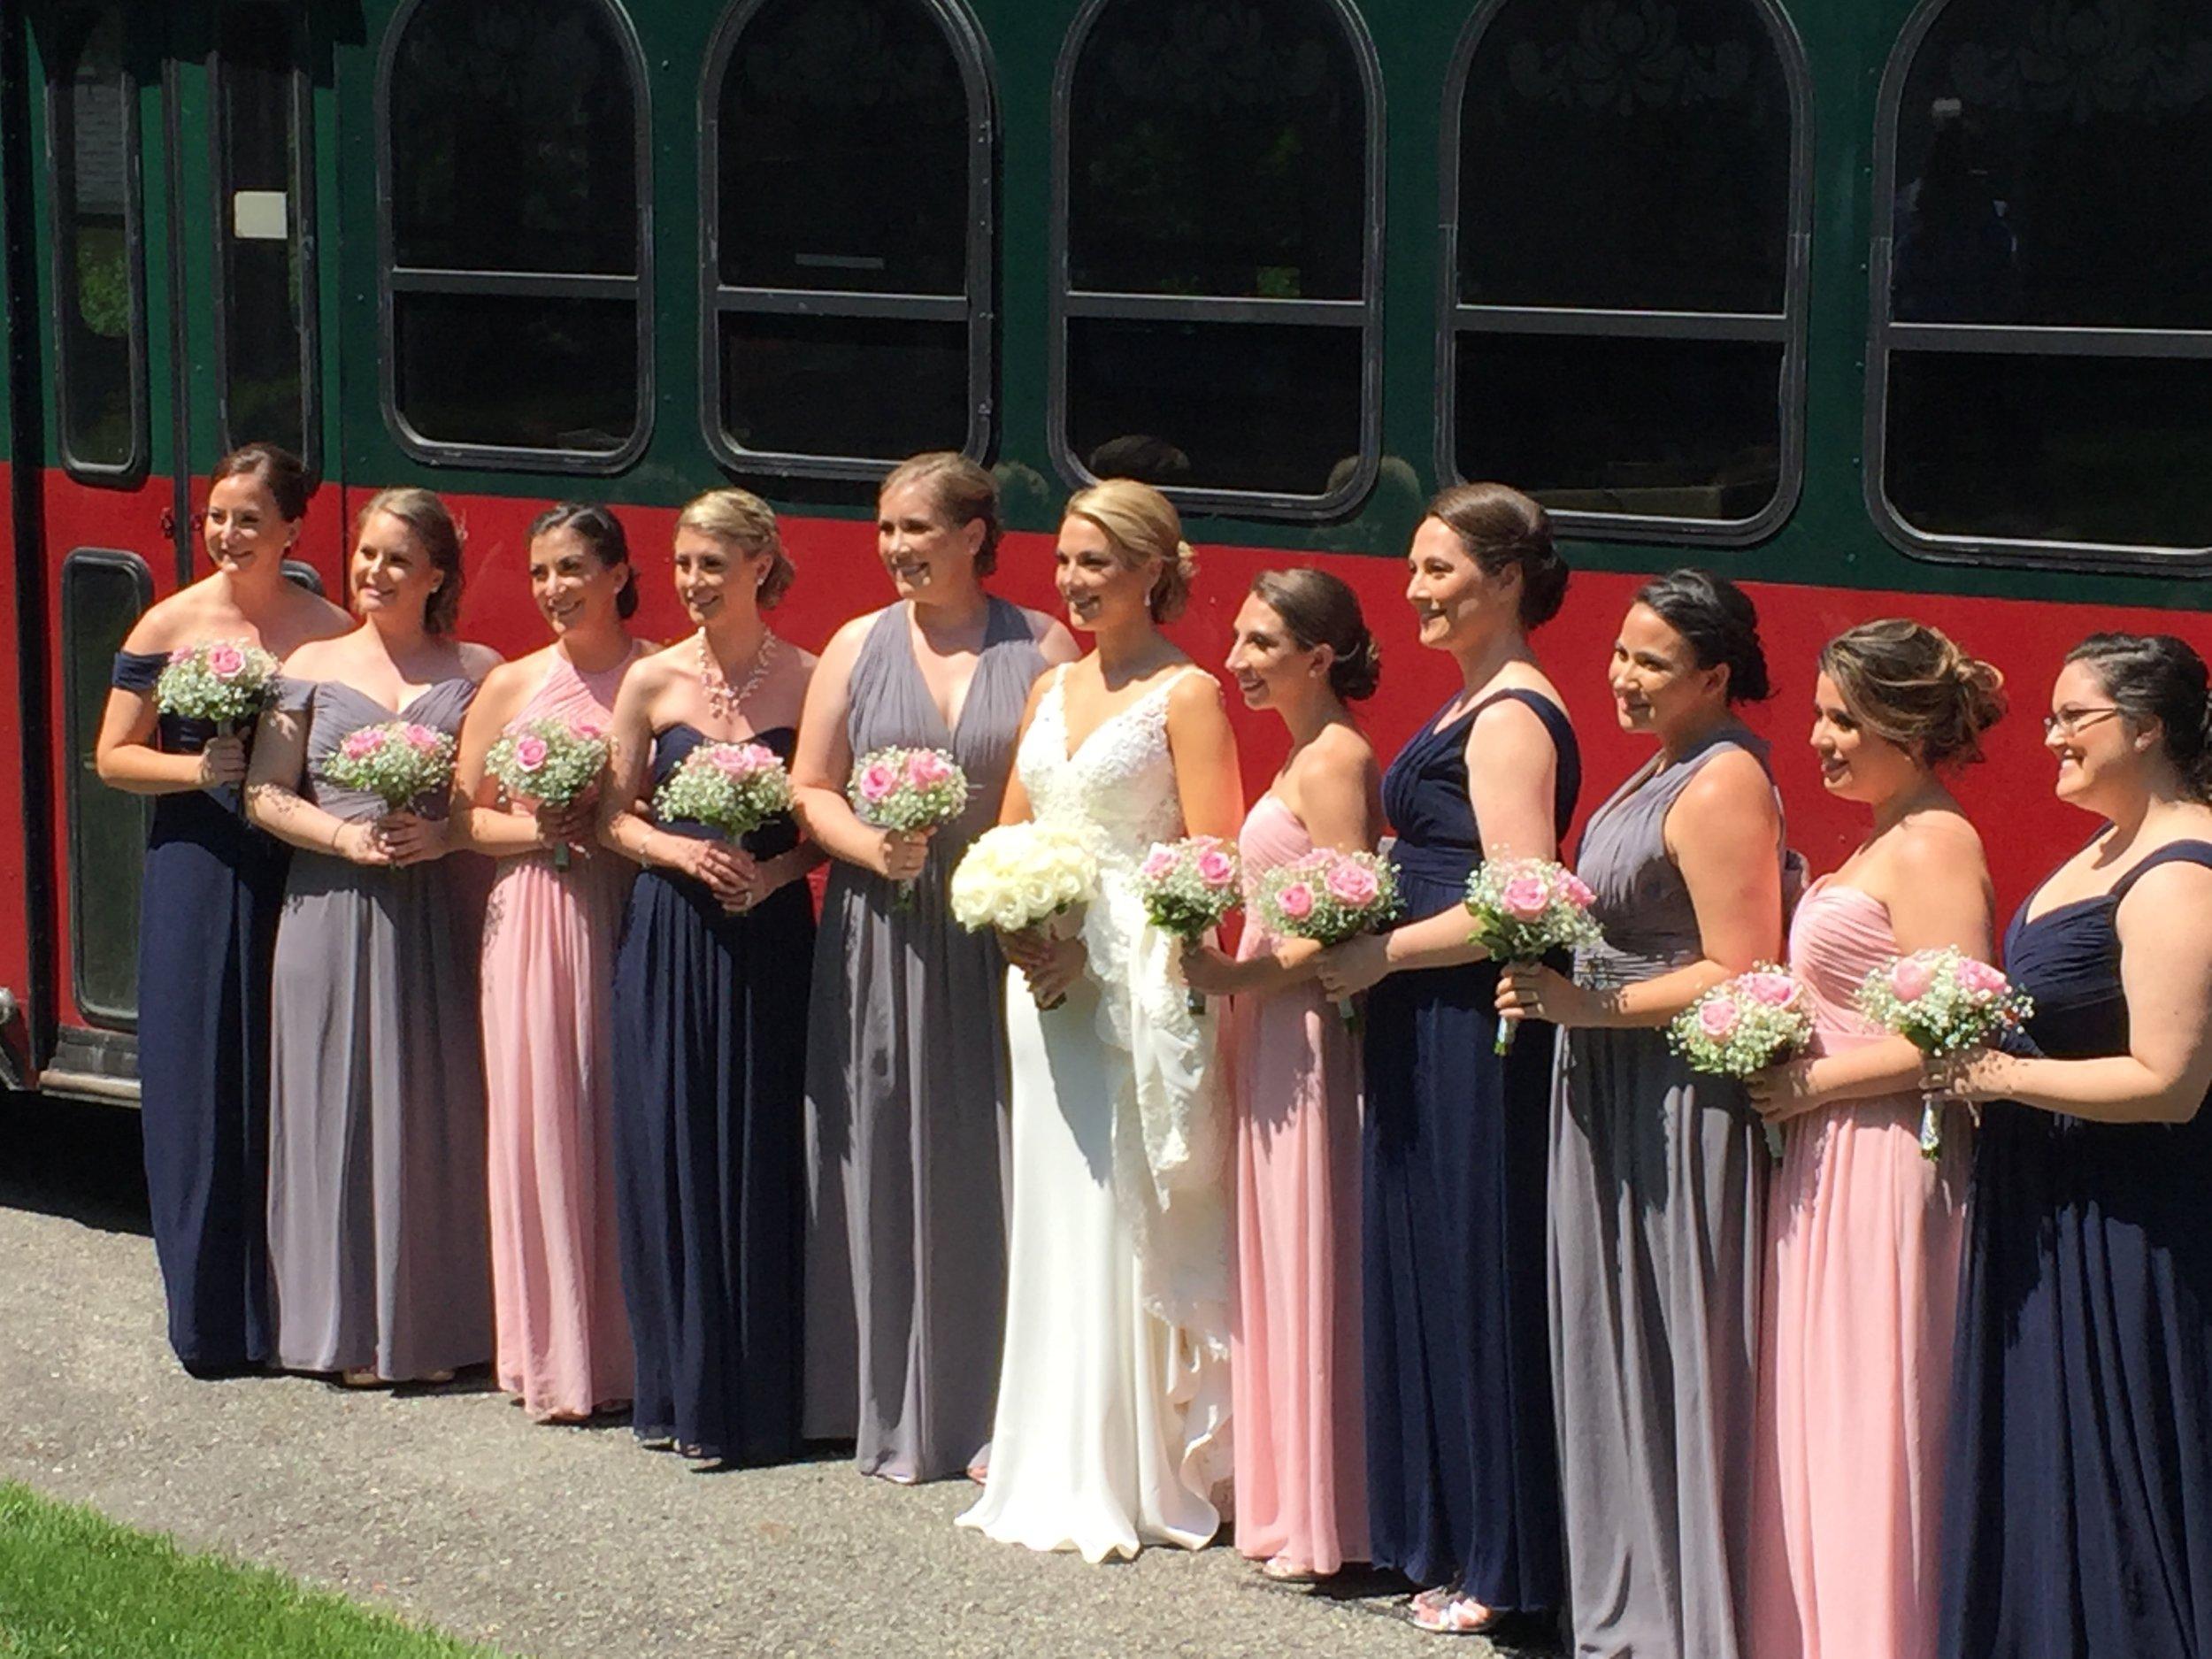 NYC Limo service with Wedding Photographer